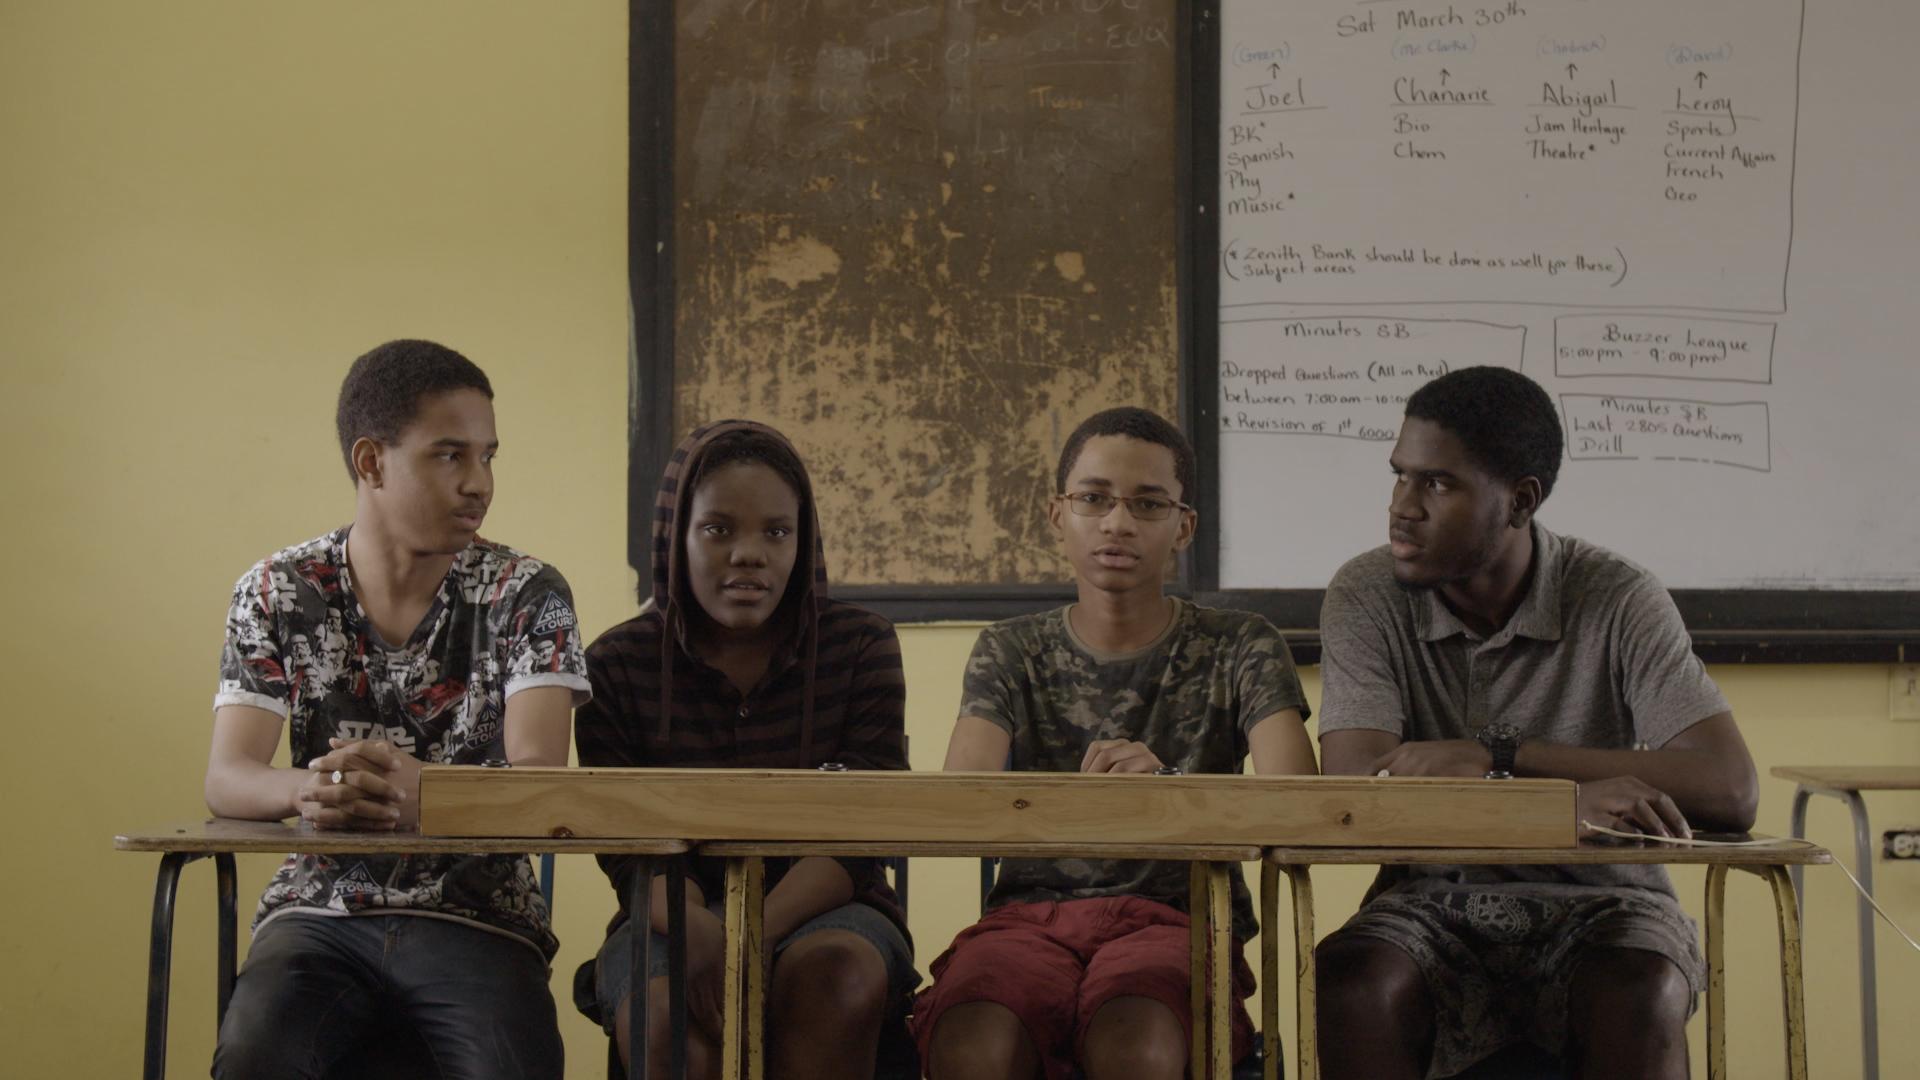 Bible Verses, Reggae Lyrics, and Human Anatomy: Welcome to Jamaica's Biggest Quiz Show